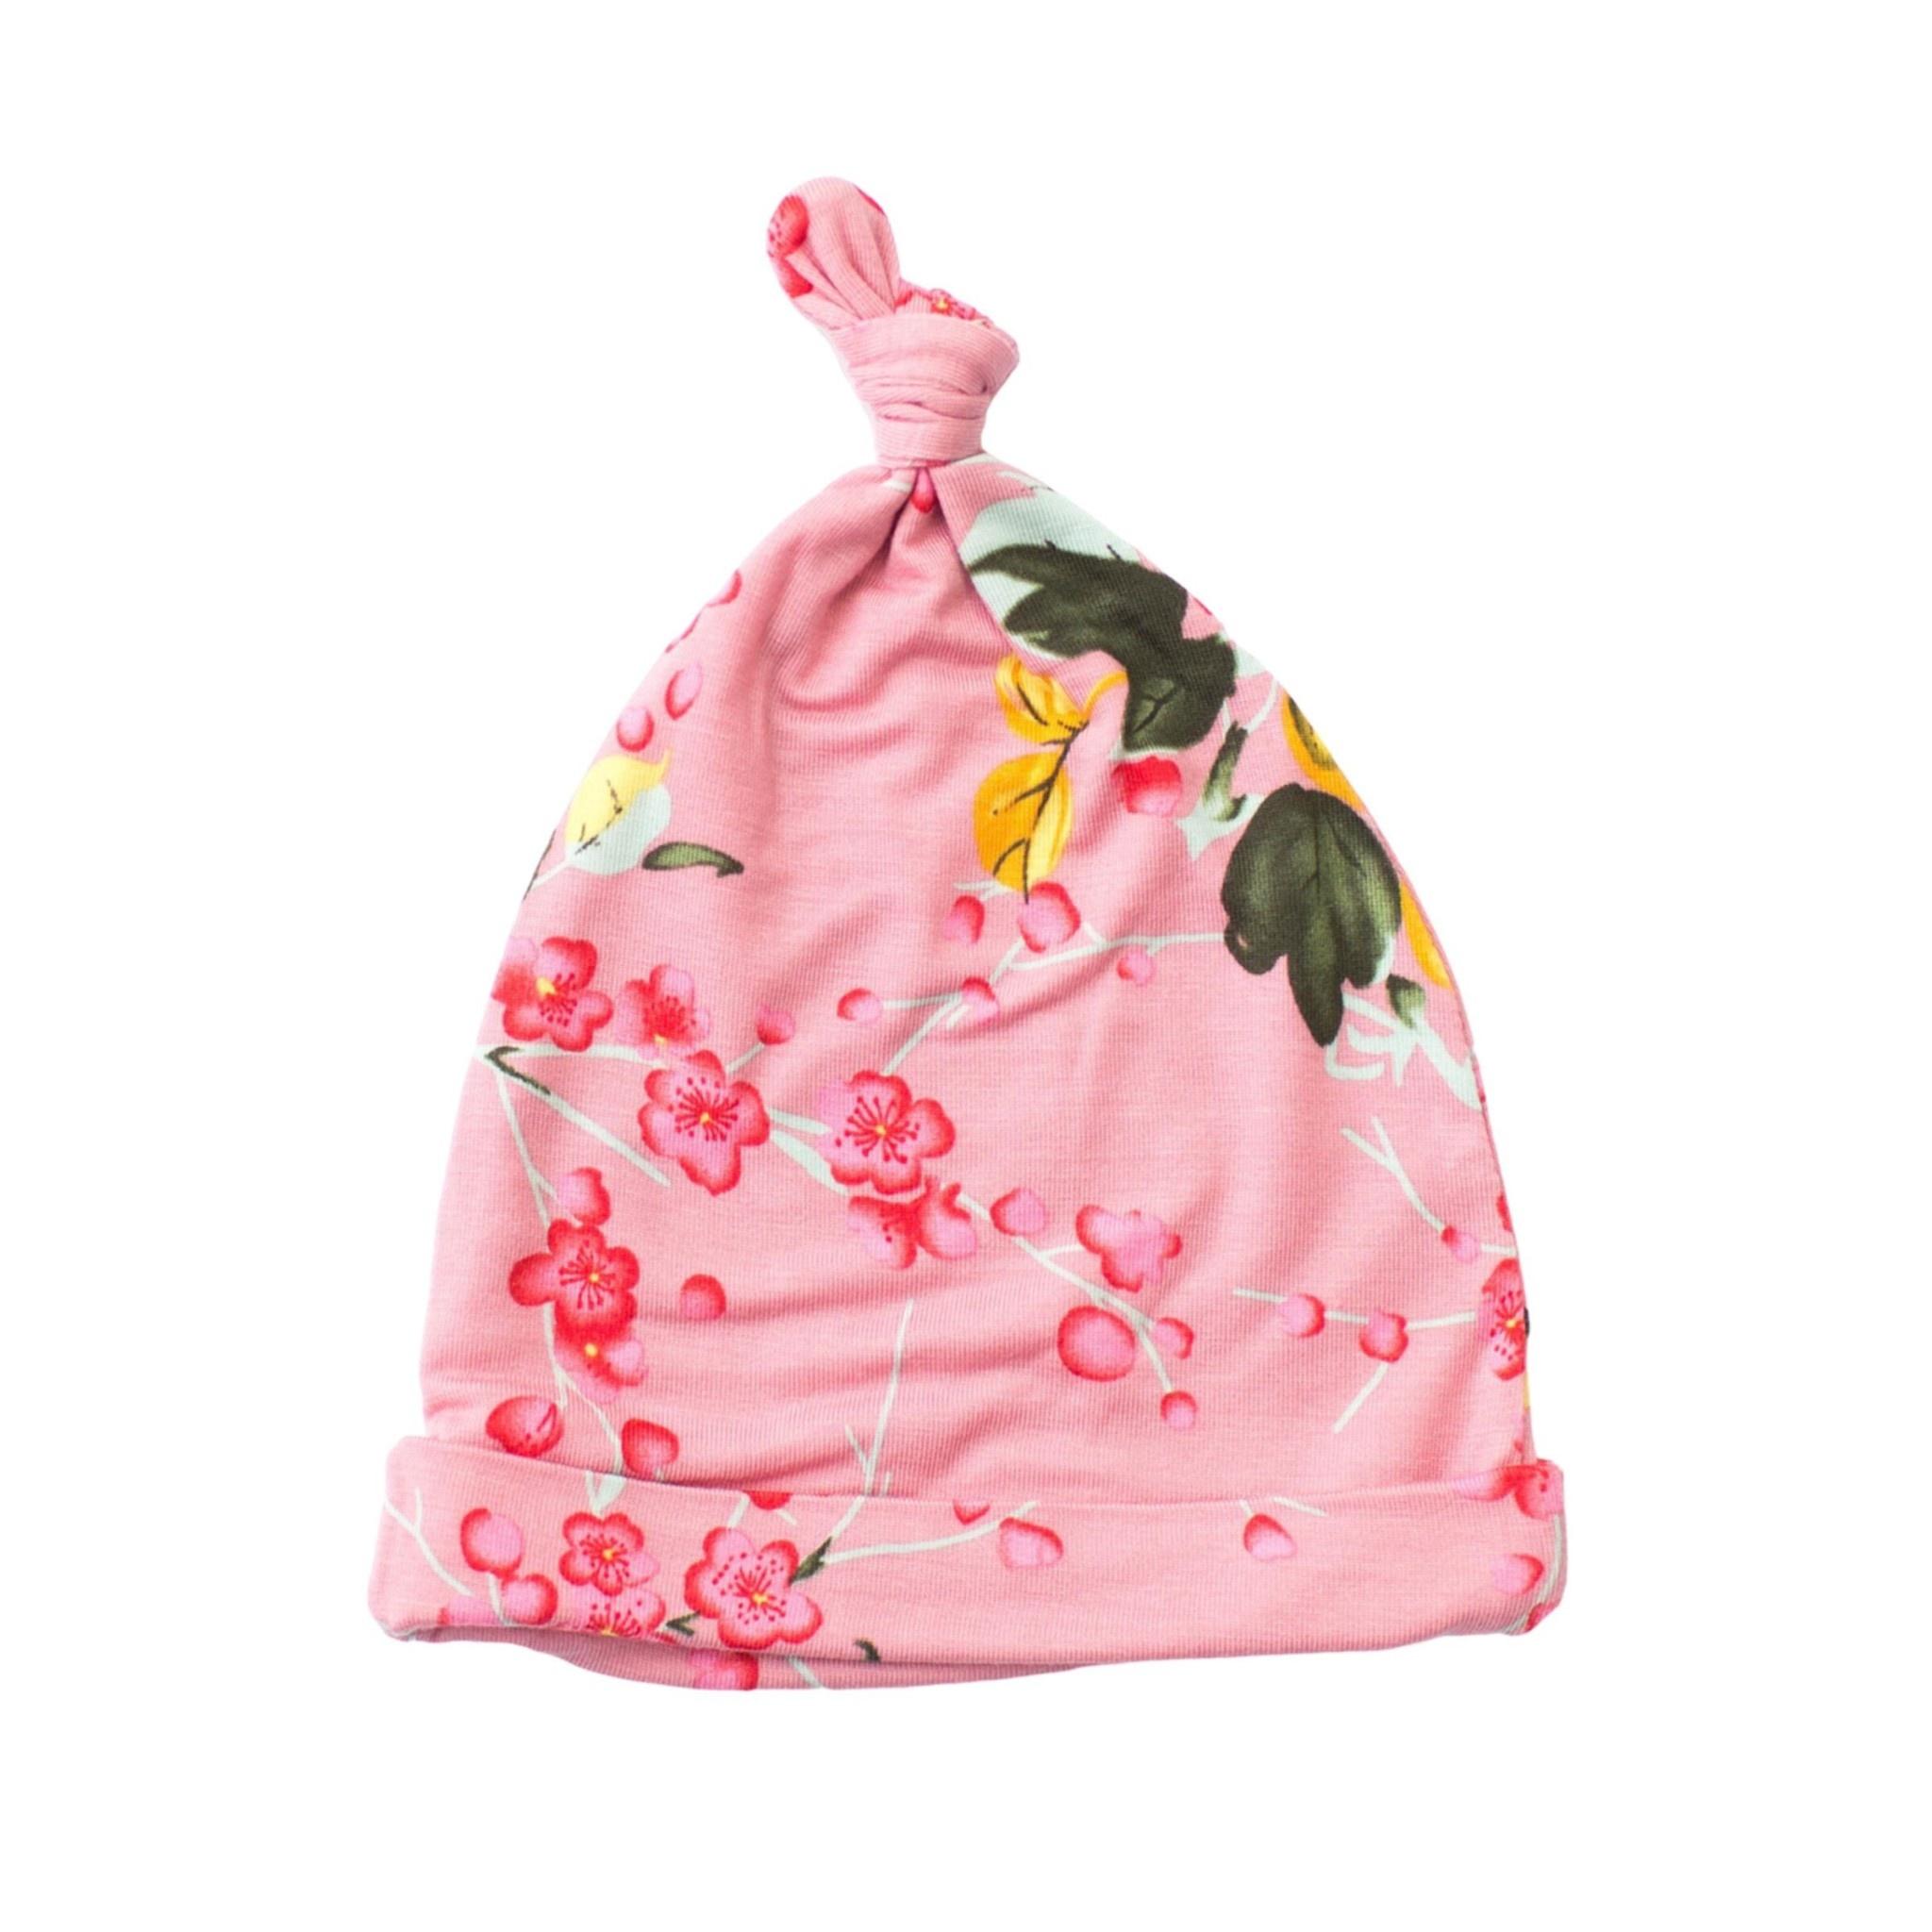 Bestaroo Cherry Blossom Hat - Rose 0-3m